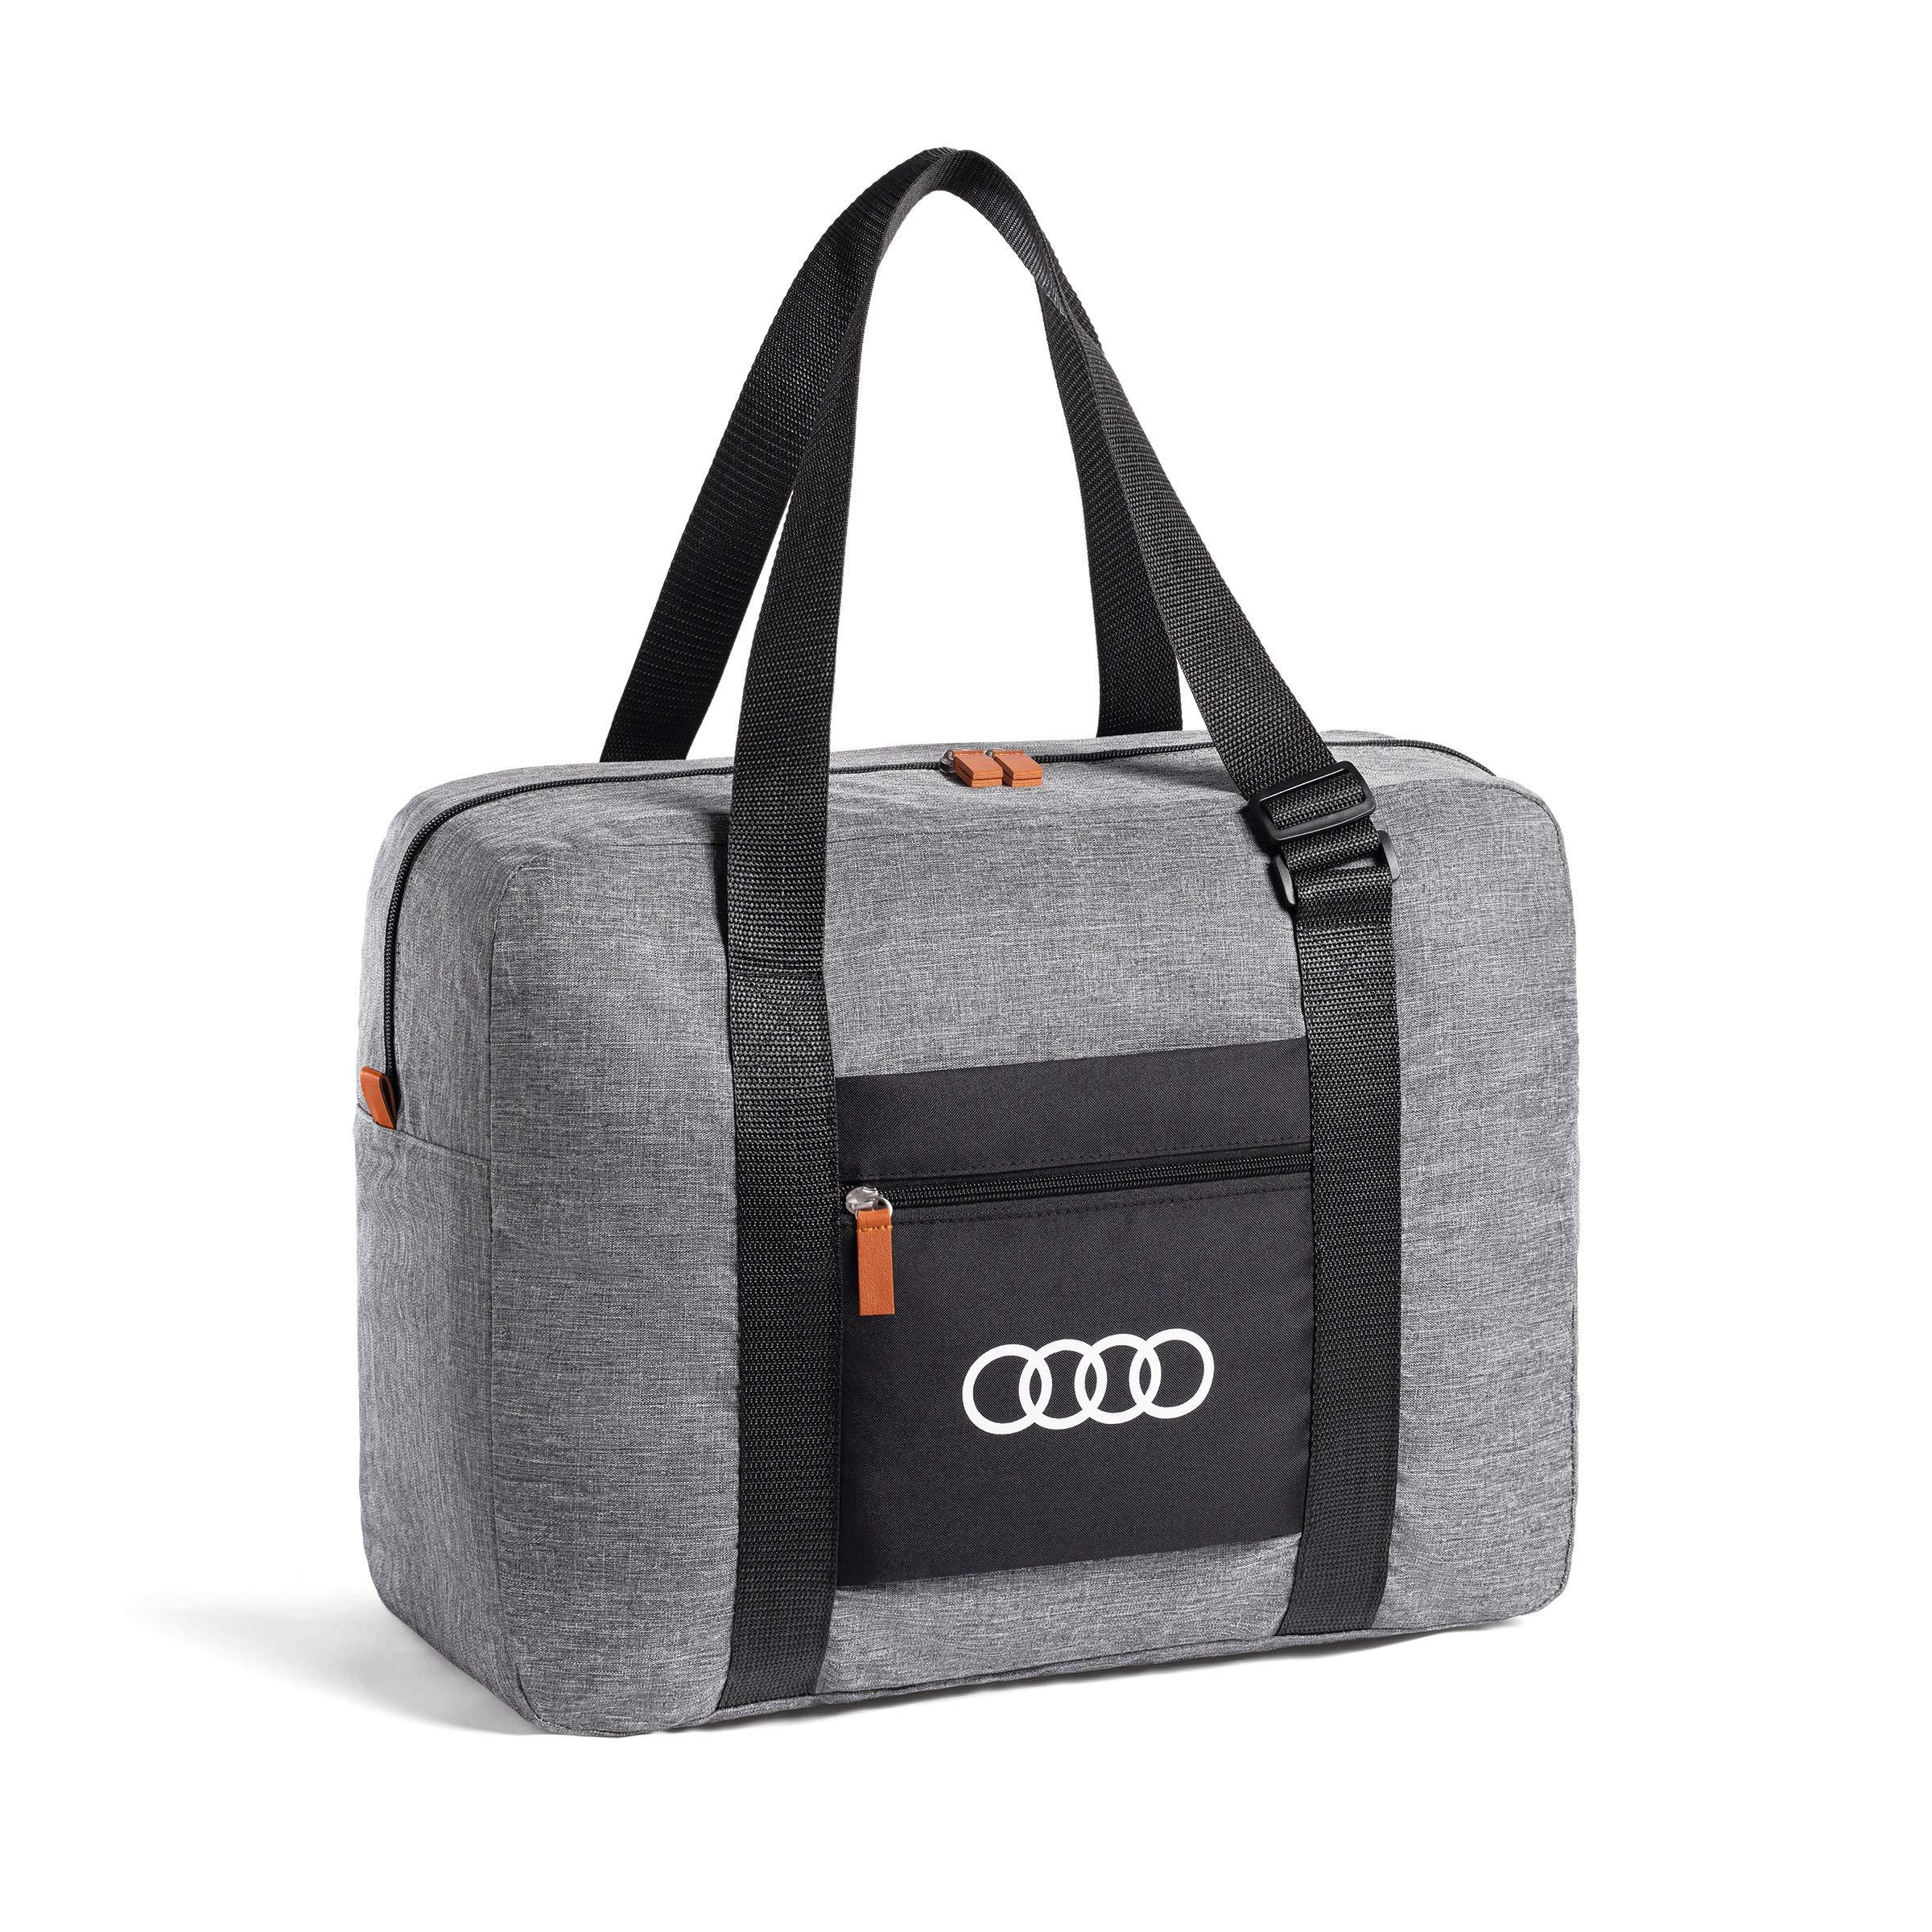 AUDI 3152000100 Foldable Carry Bag Rings Logo Handbag Light Grey